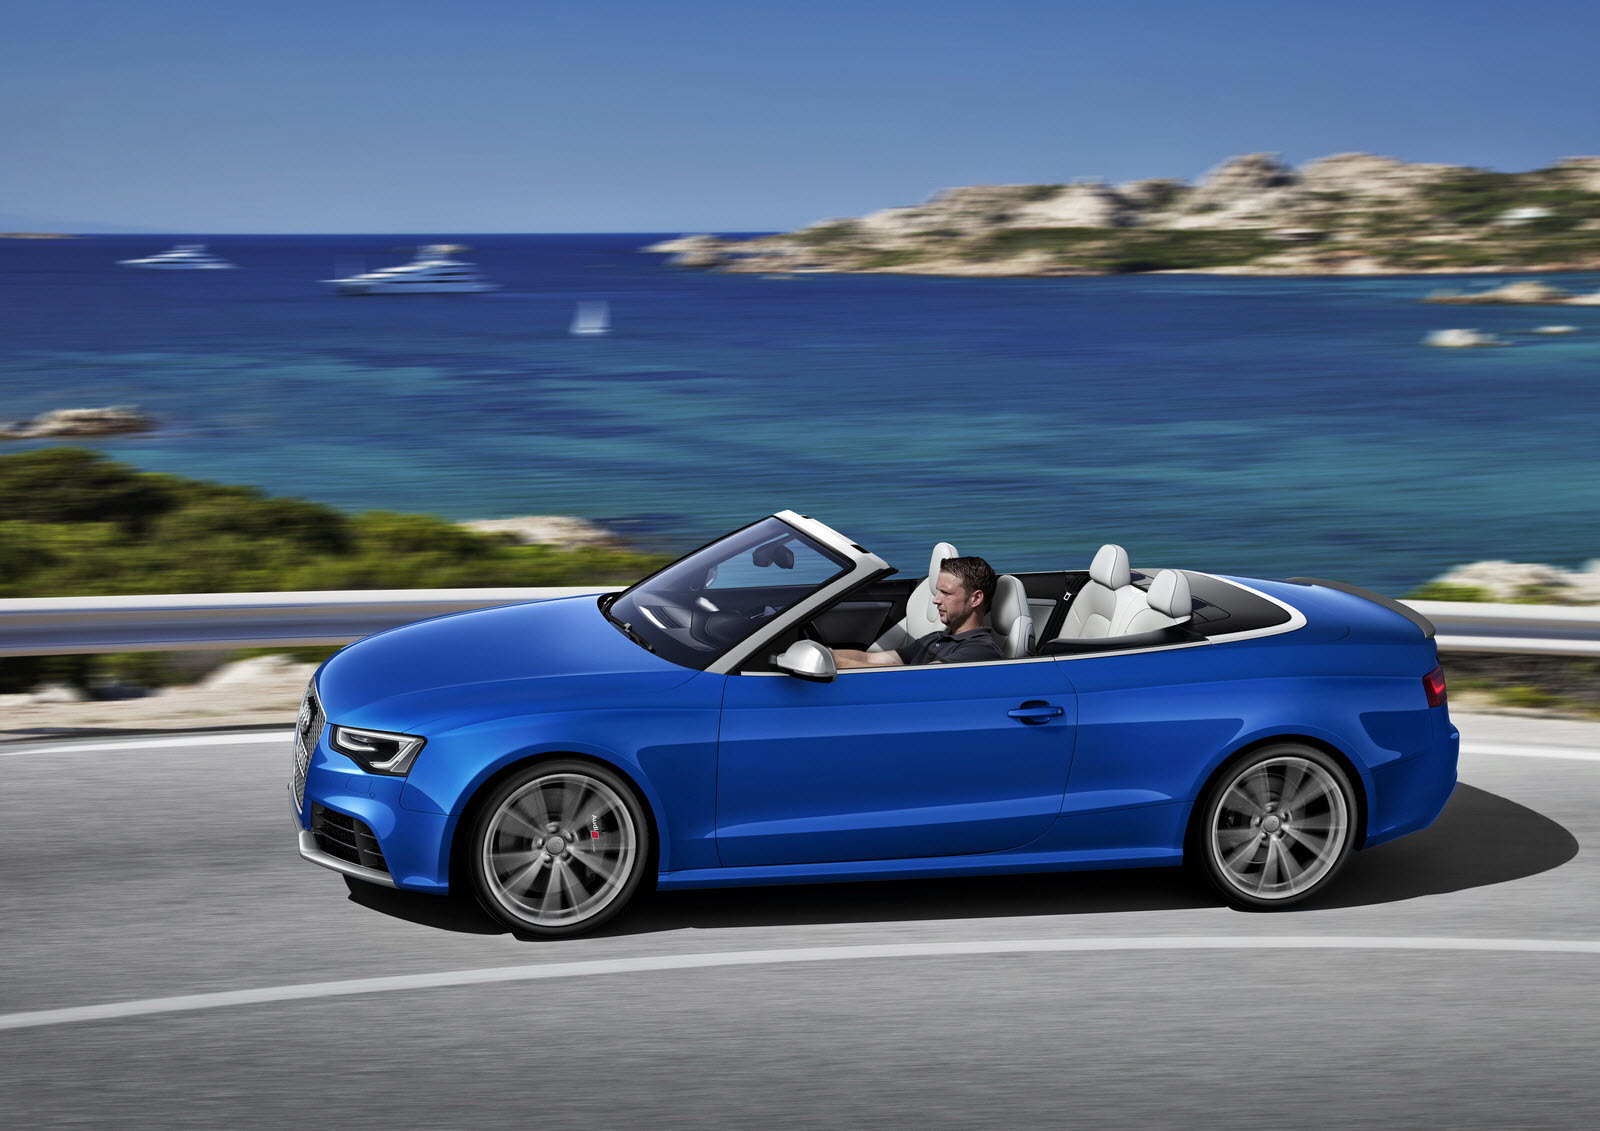 Blue Audi RS5 Side Angle wallpapers | Blue Audi RS5 Side Angle ...